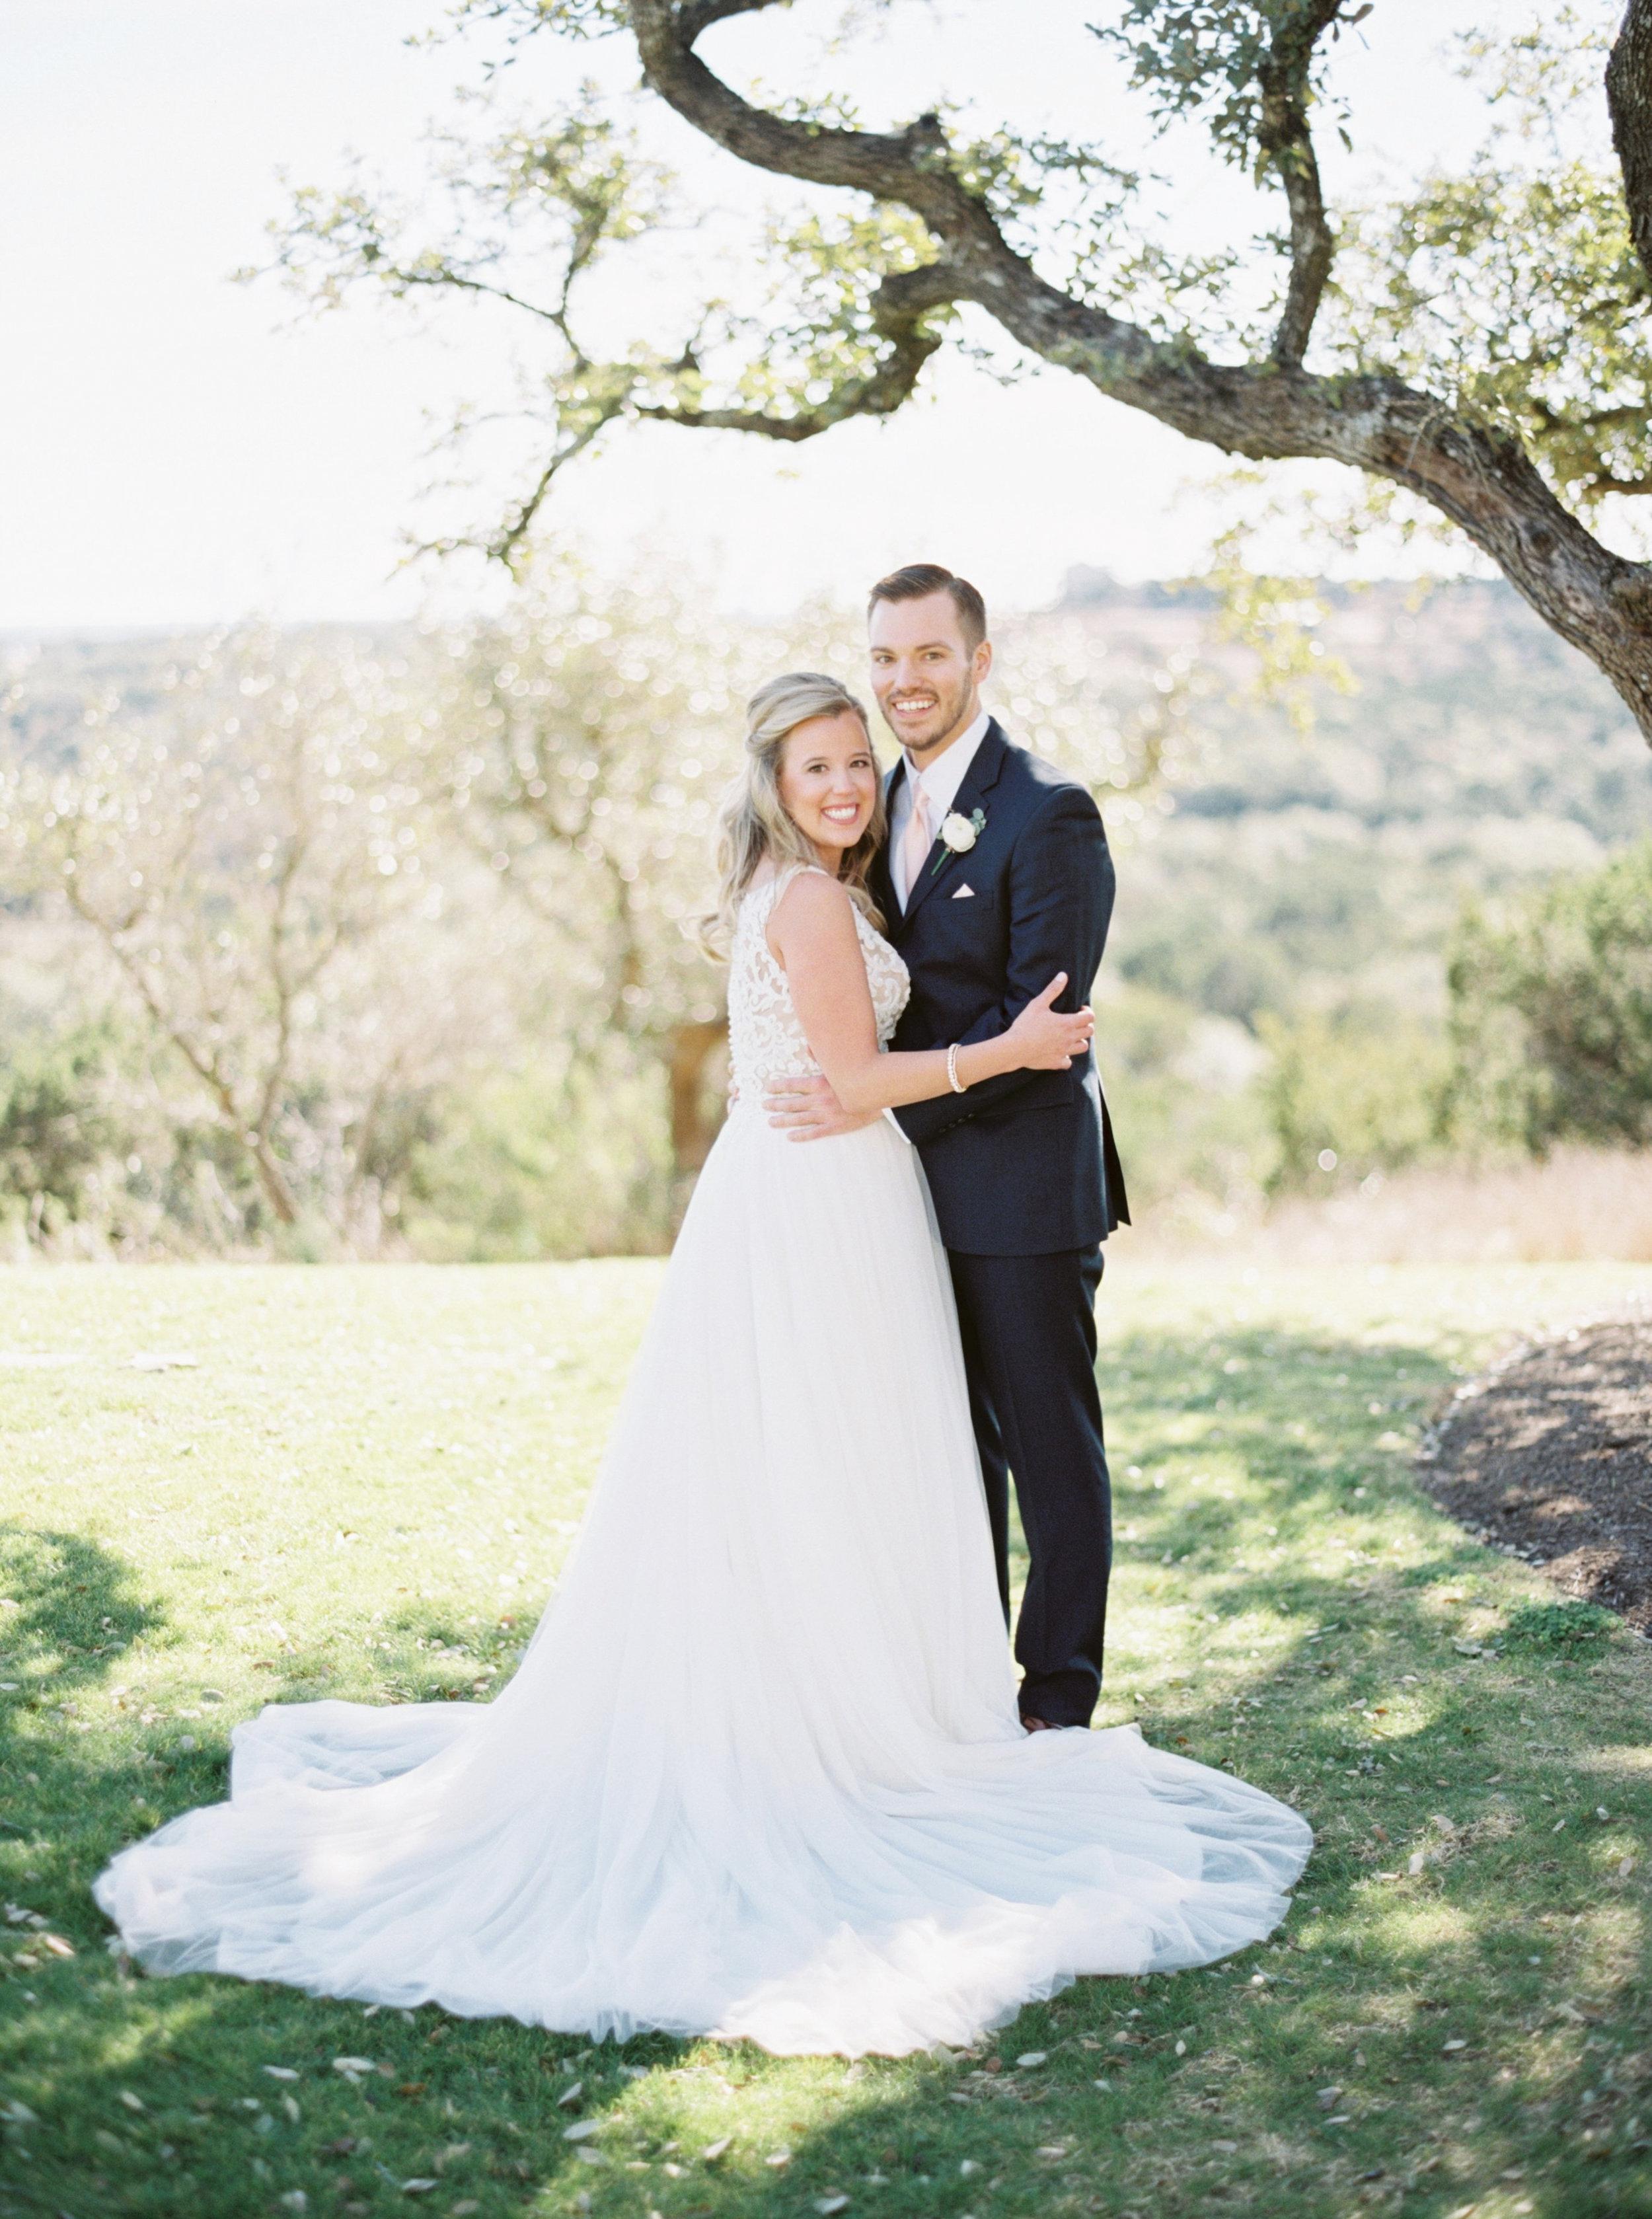 EMILY + DEVIN   CANYONWOOD RIDGE WEDDING - COMING SOON